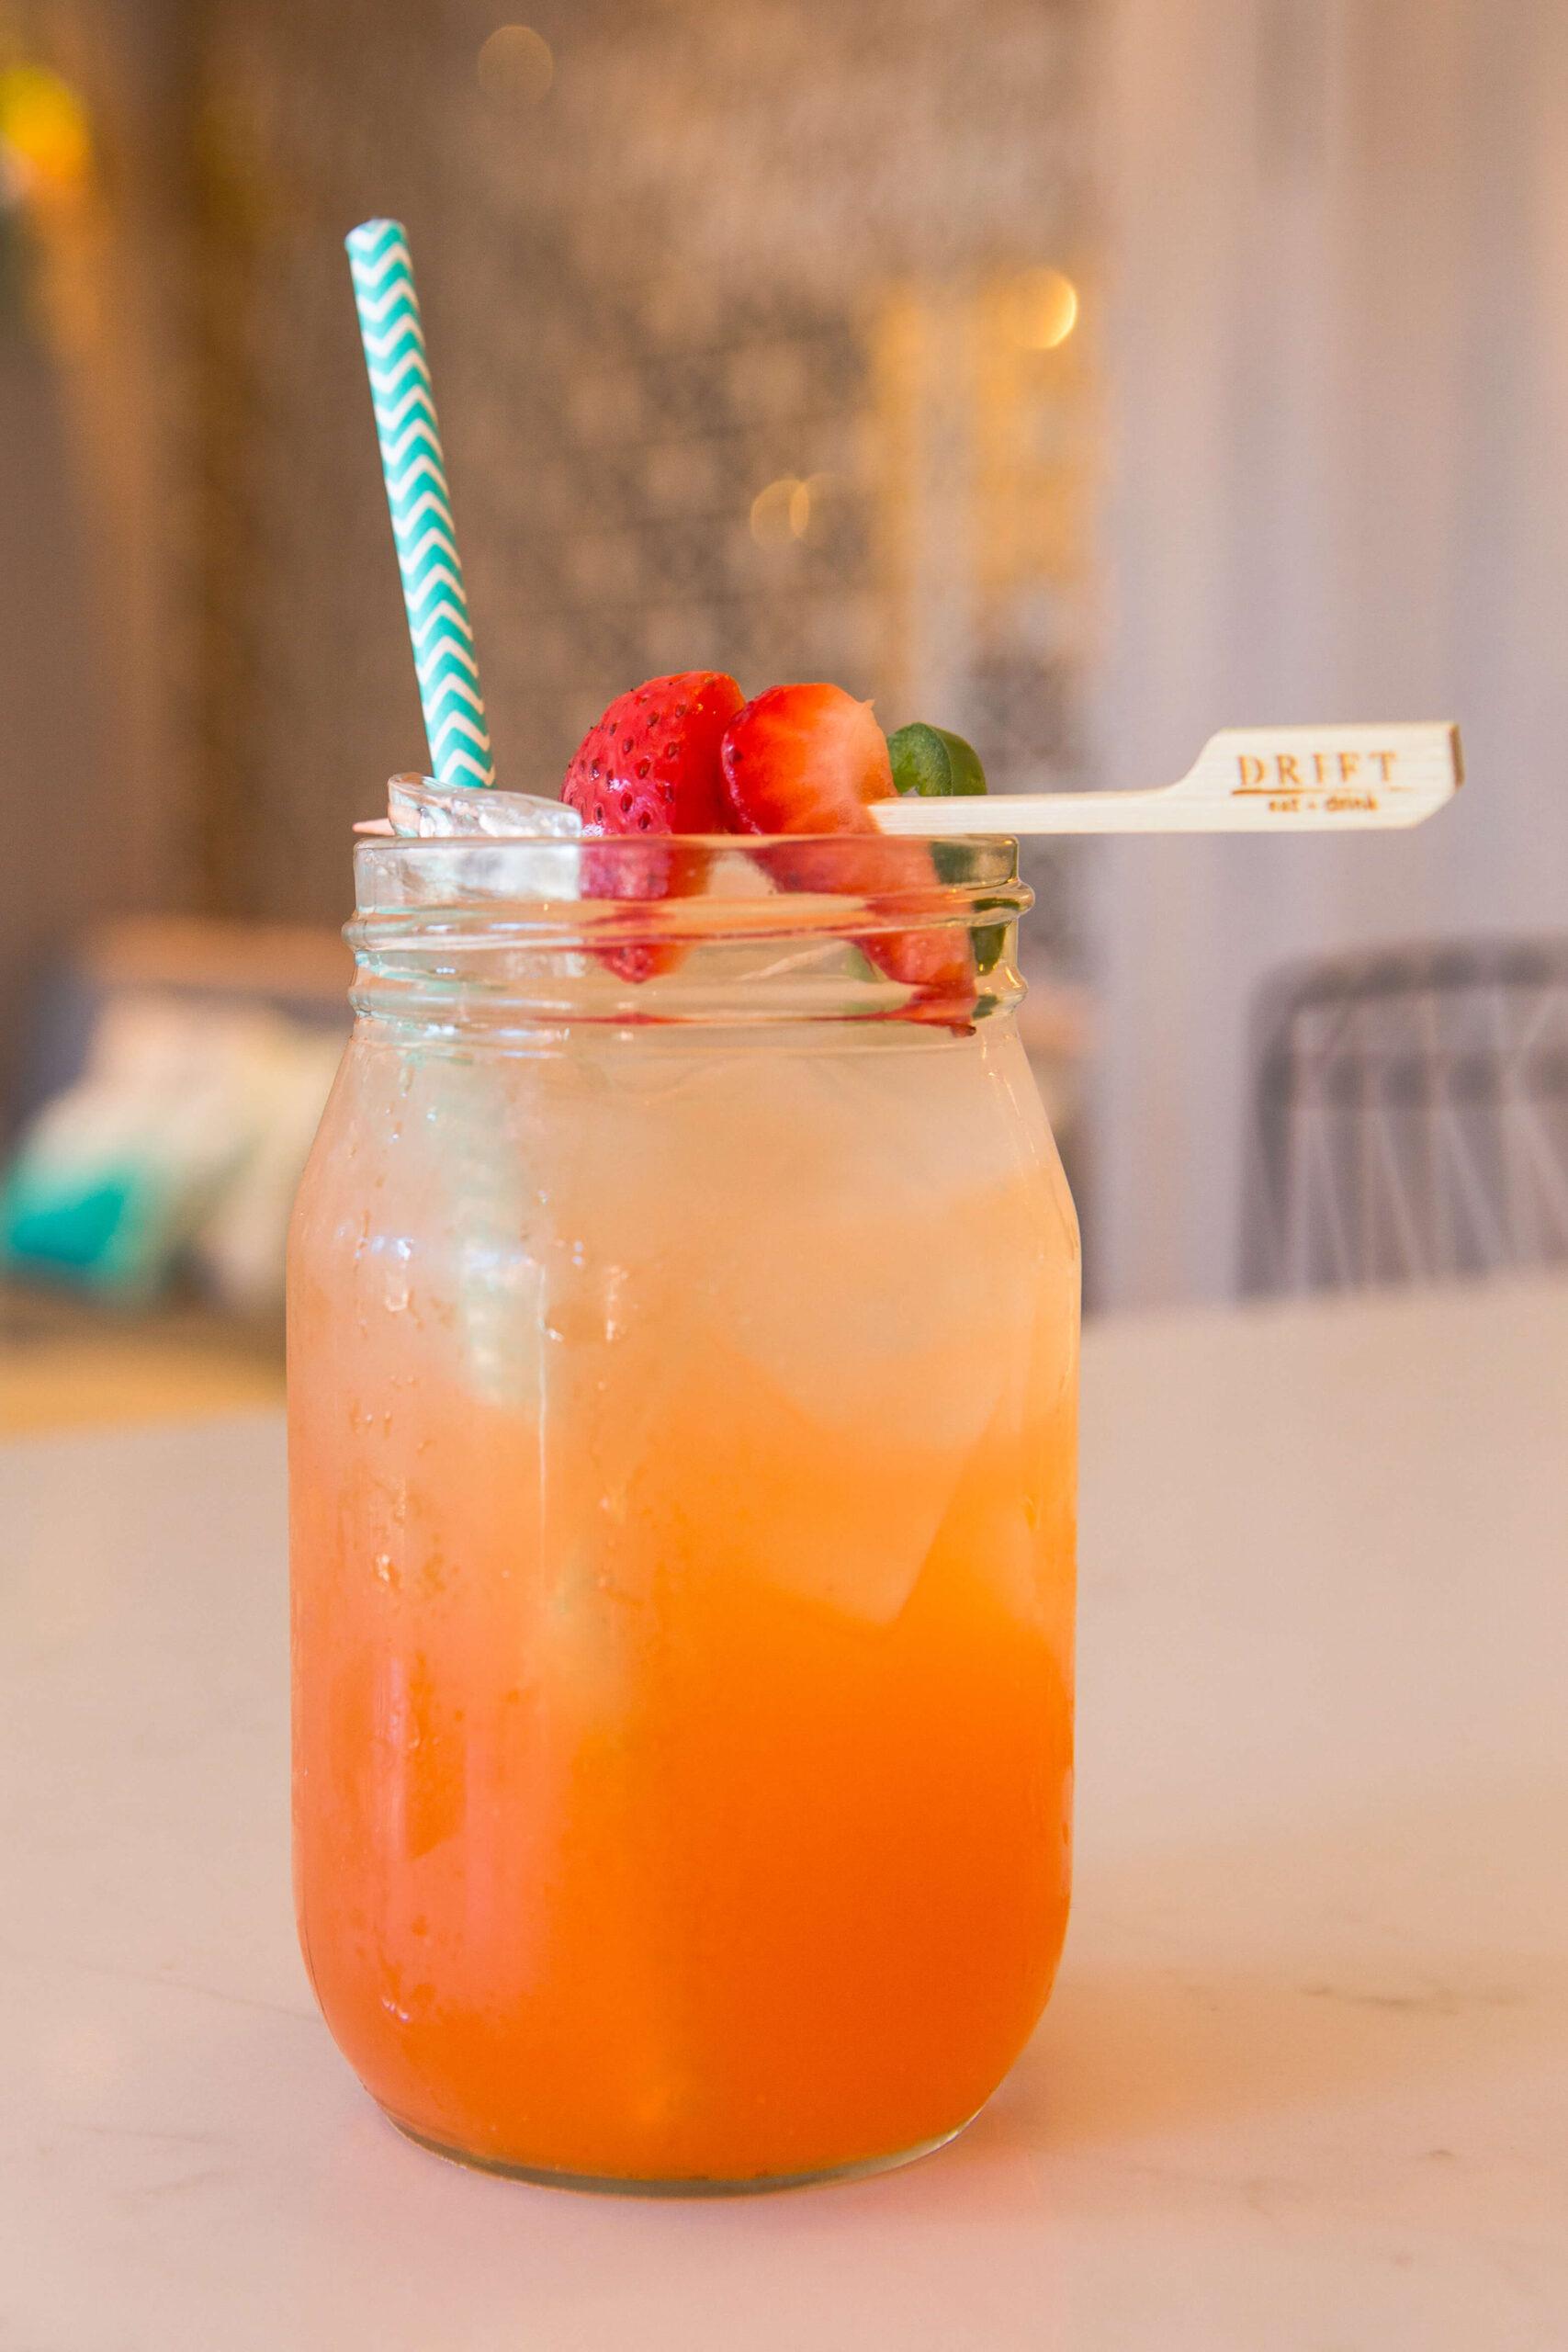 RBS_Hyatt_La Jolla_Drift_Cocktail